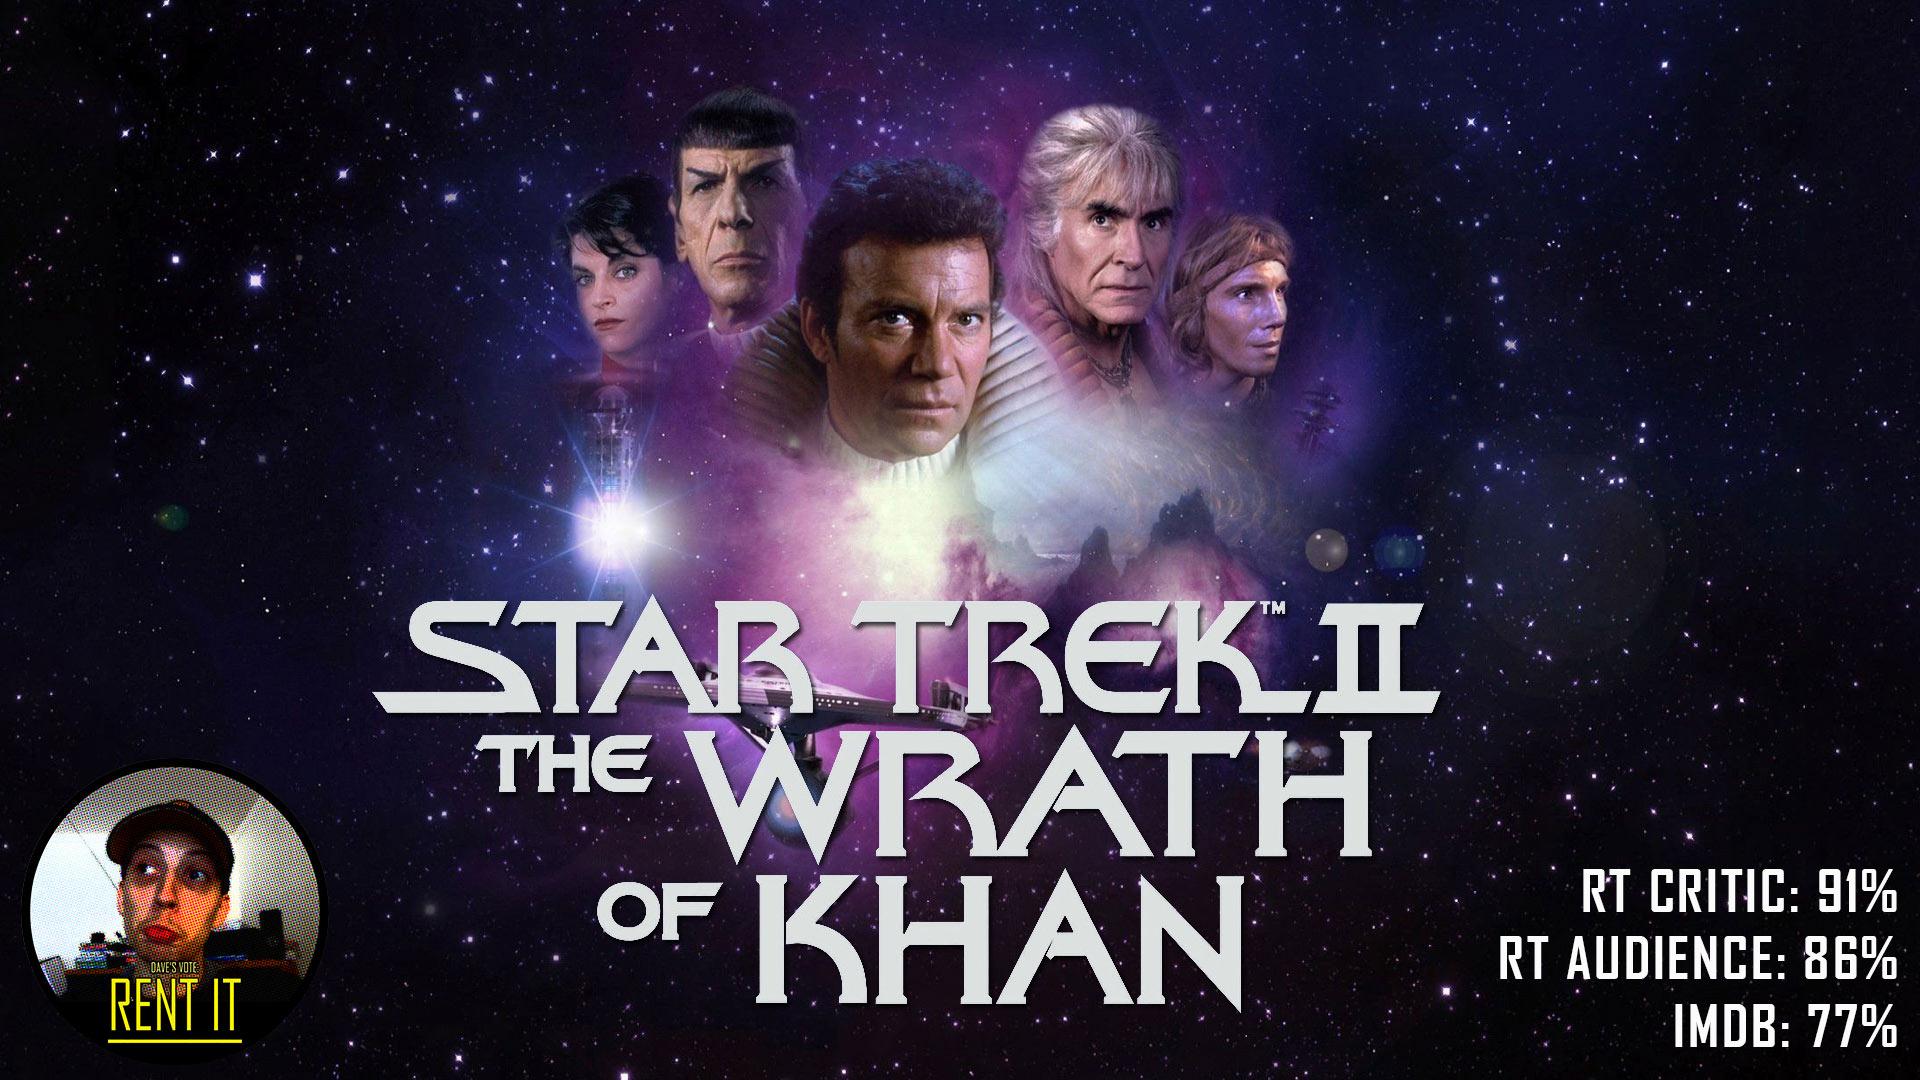 star trek ii the wrath of khan 1982 � dave examines movies